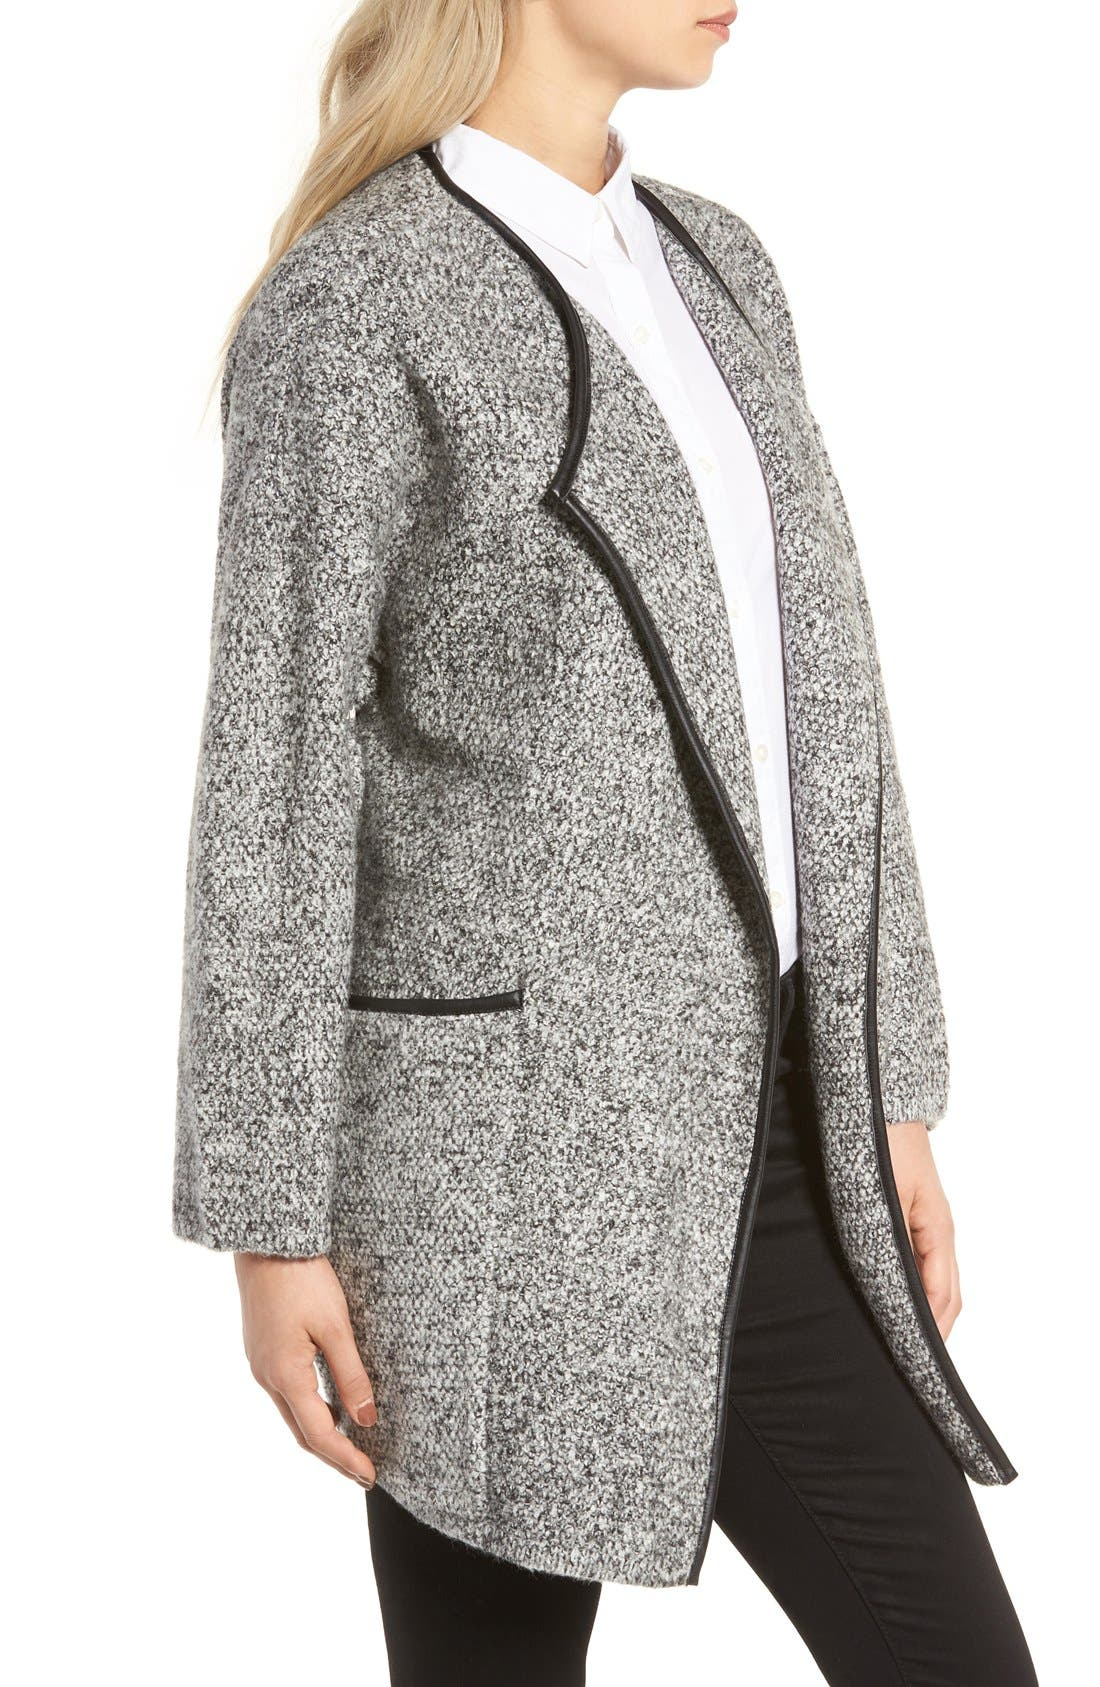 ASTR THE LABEL,                             ASTR Drape Front Sweater Jacket,                             Alternate thumbnail 6, color,                             001